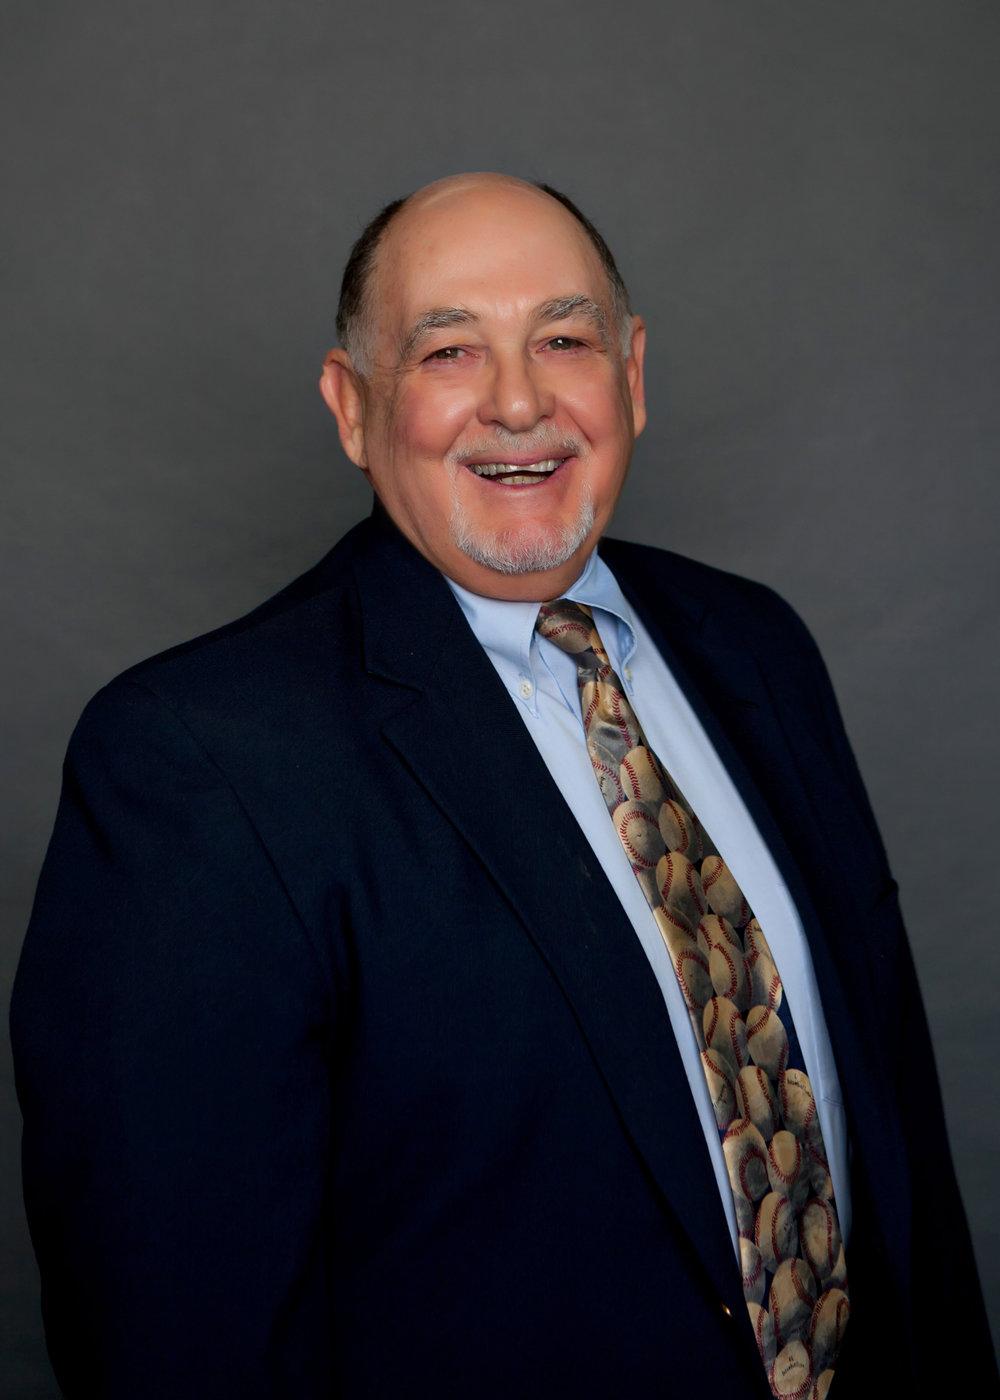 Joseph P. Rice, III, Attorney